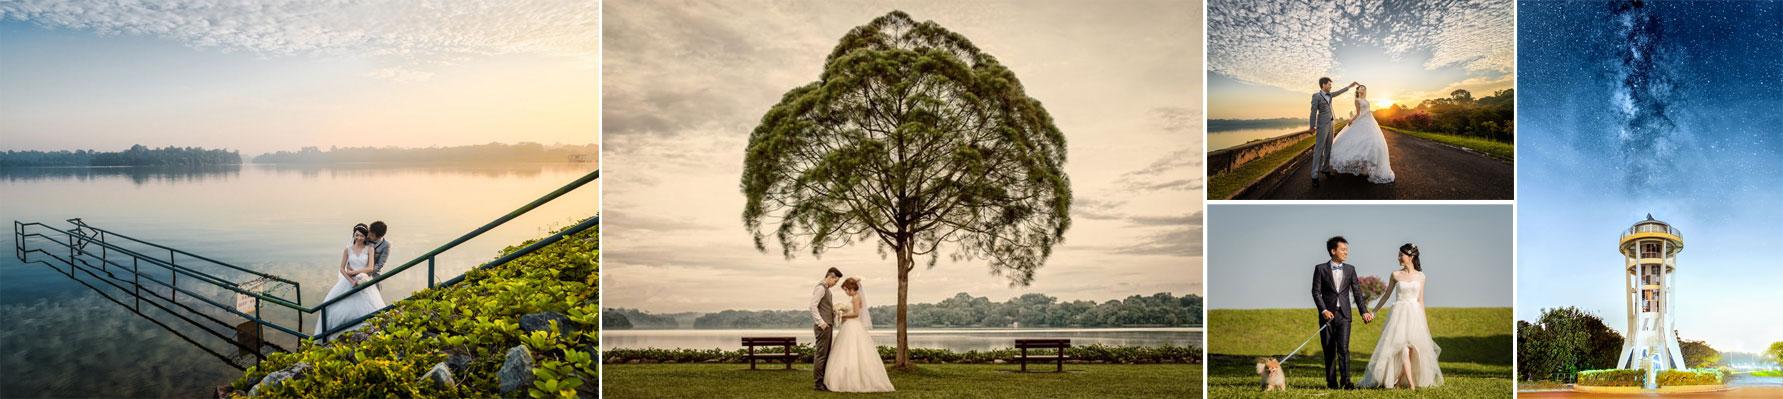 Upper-Seletar-Reservoir-singapore-wedding